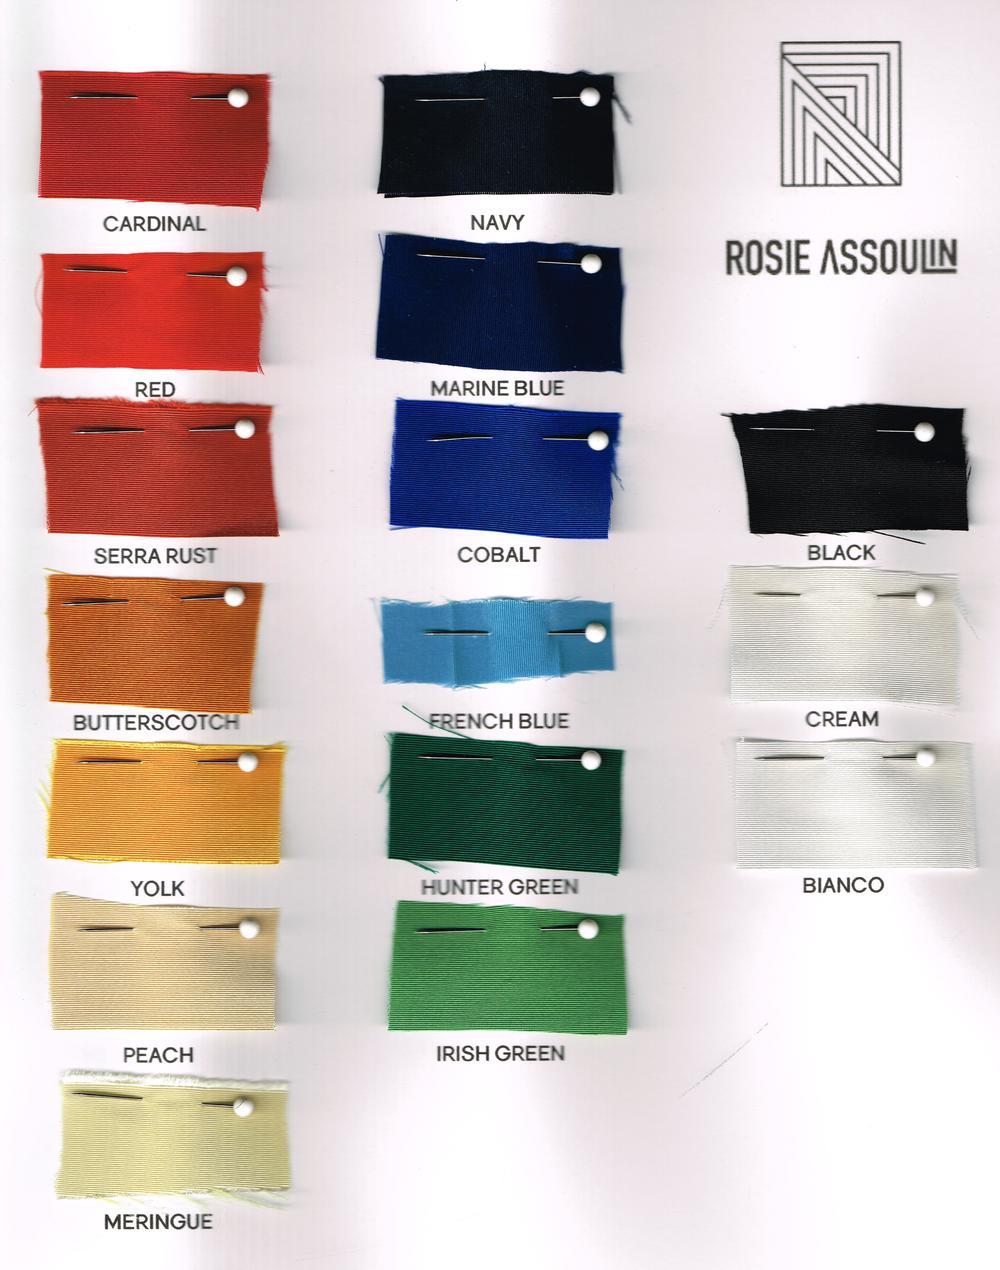 Rosie Resort 2015 Silk Faille Color Card.jpg